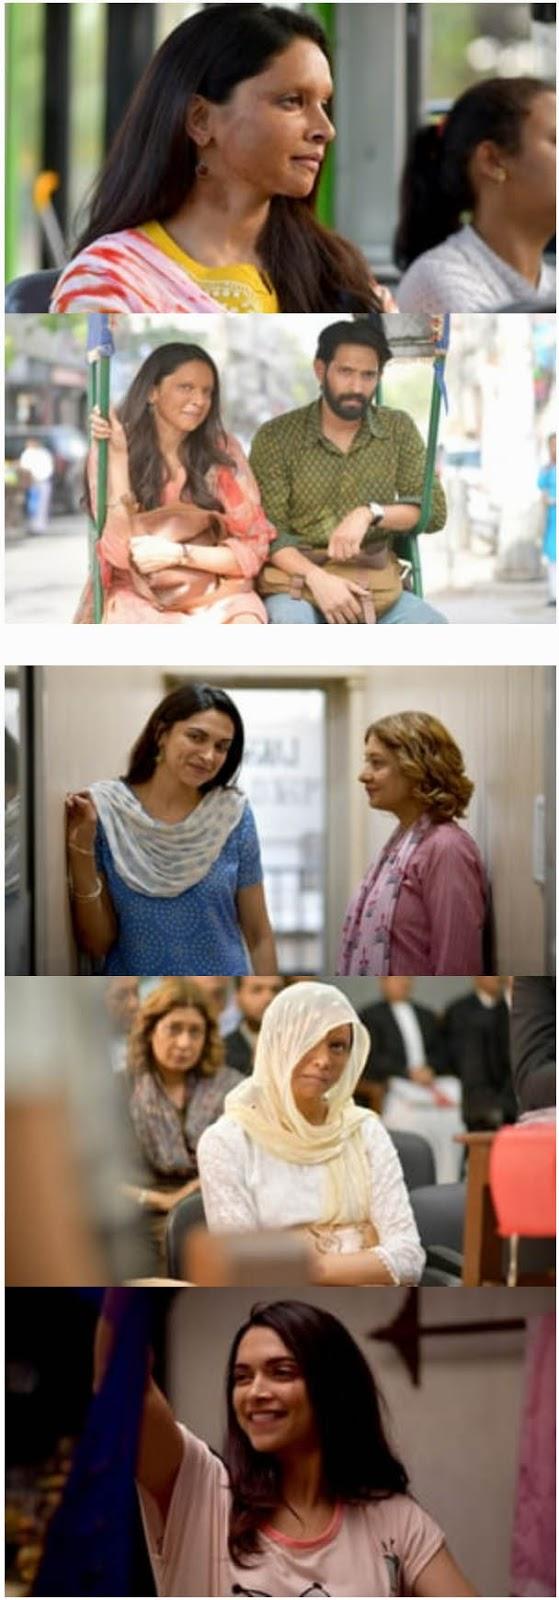 Chhapaak full movie download utorrent, chhapaak full movie download filmyzilla